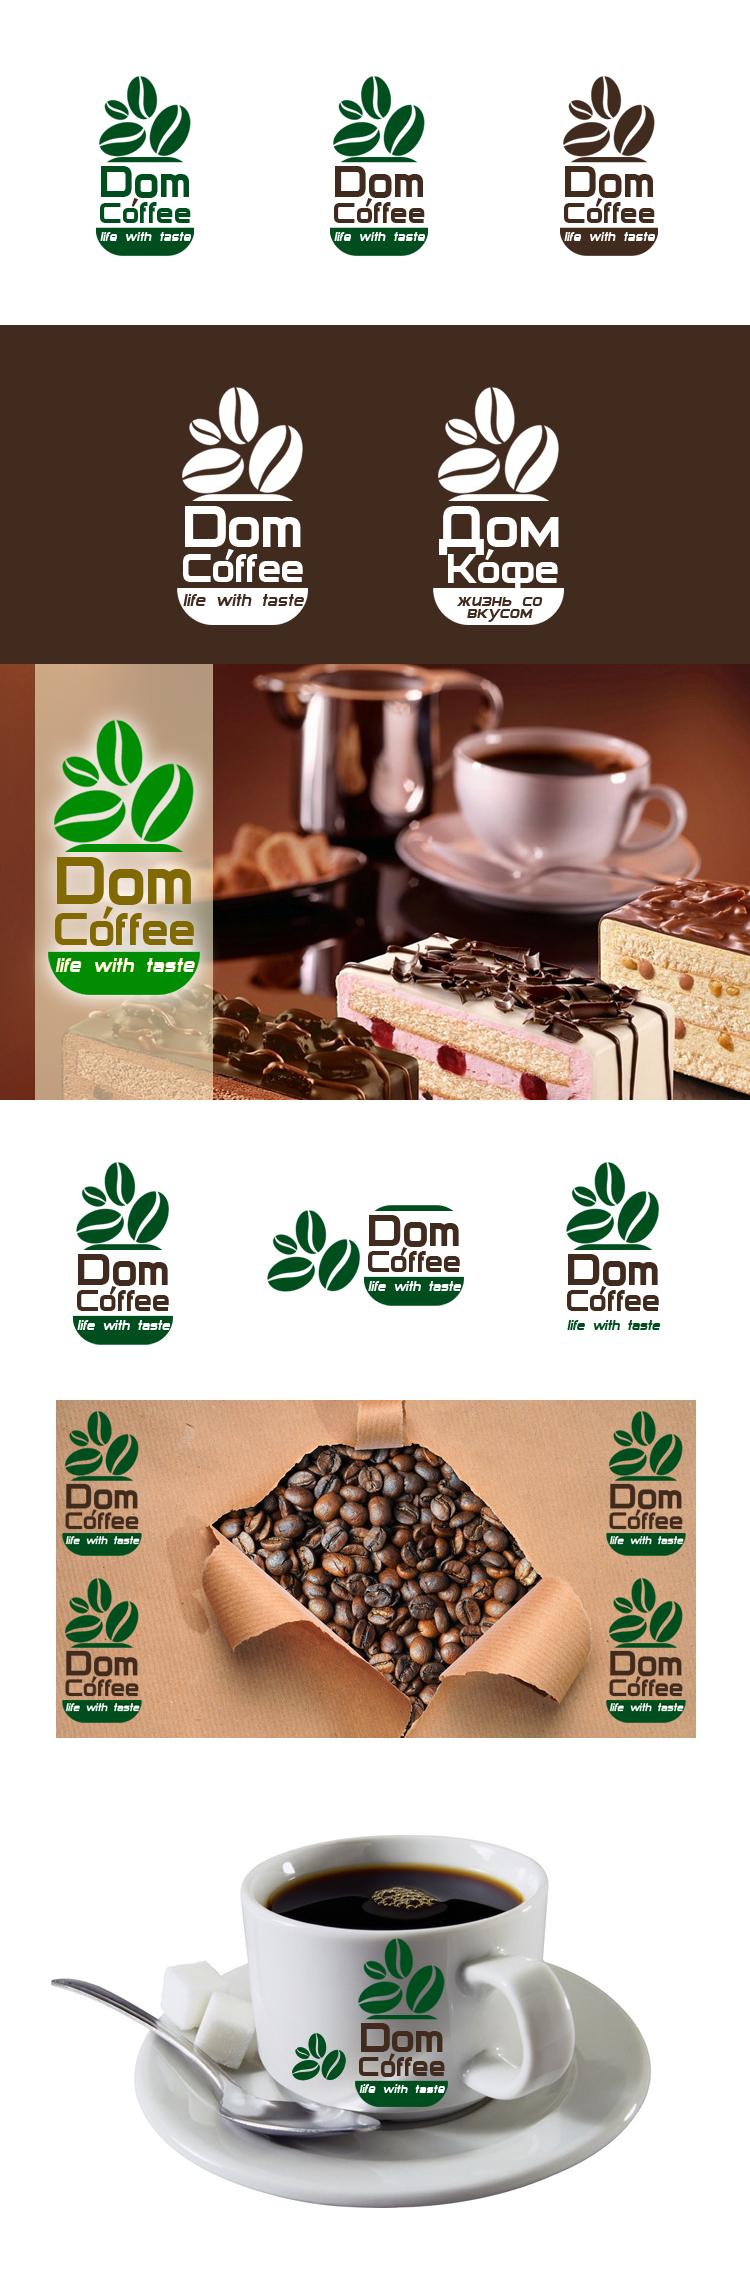 Редизайн логотипа фото f_190533d98aba4b02.jpg